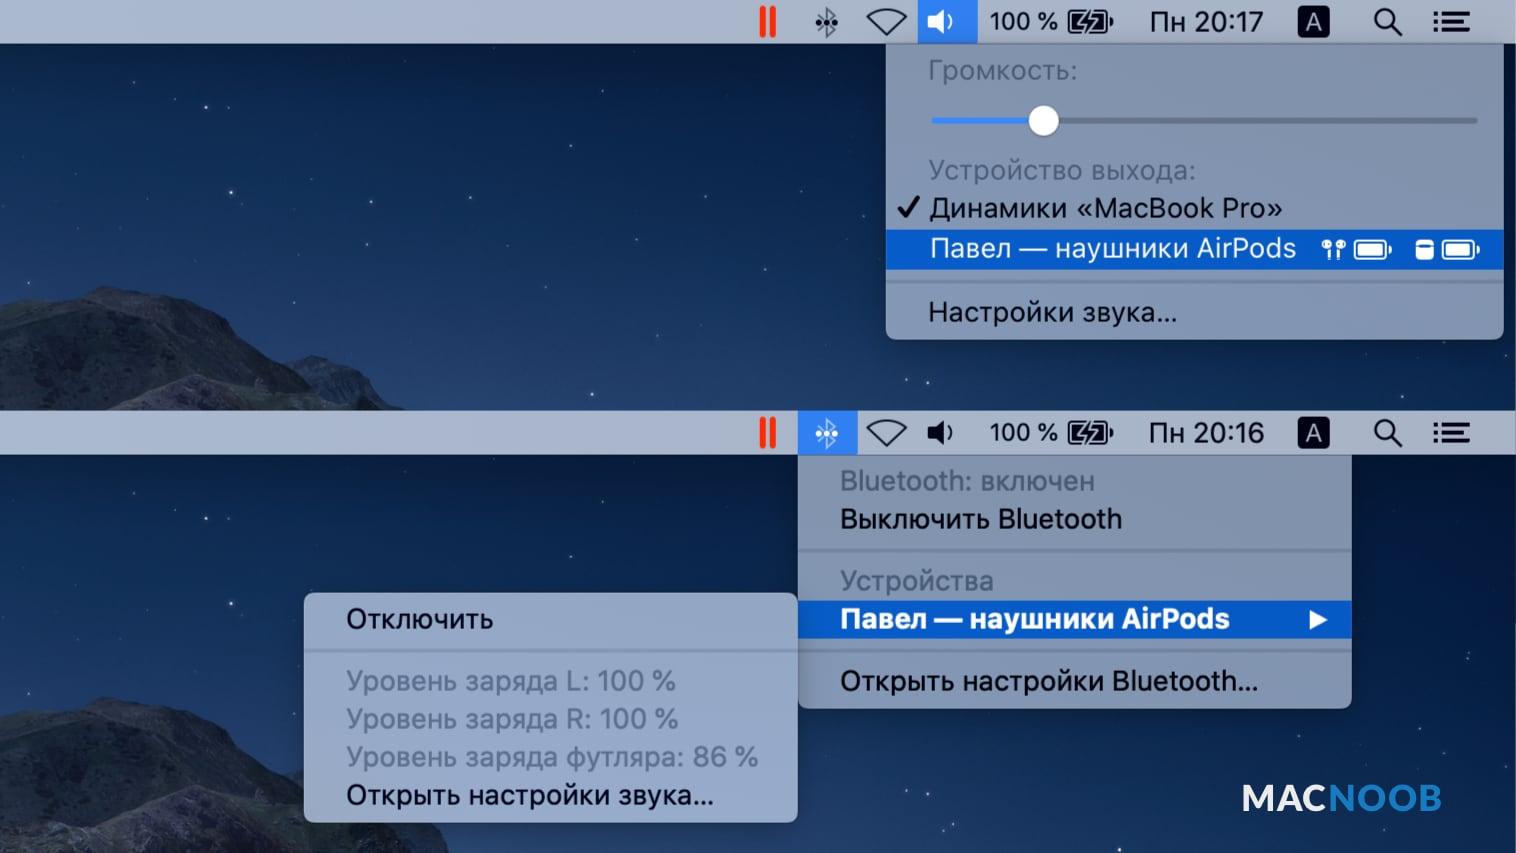 kak podklyuchit airpods k macbook imac mac pro